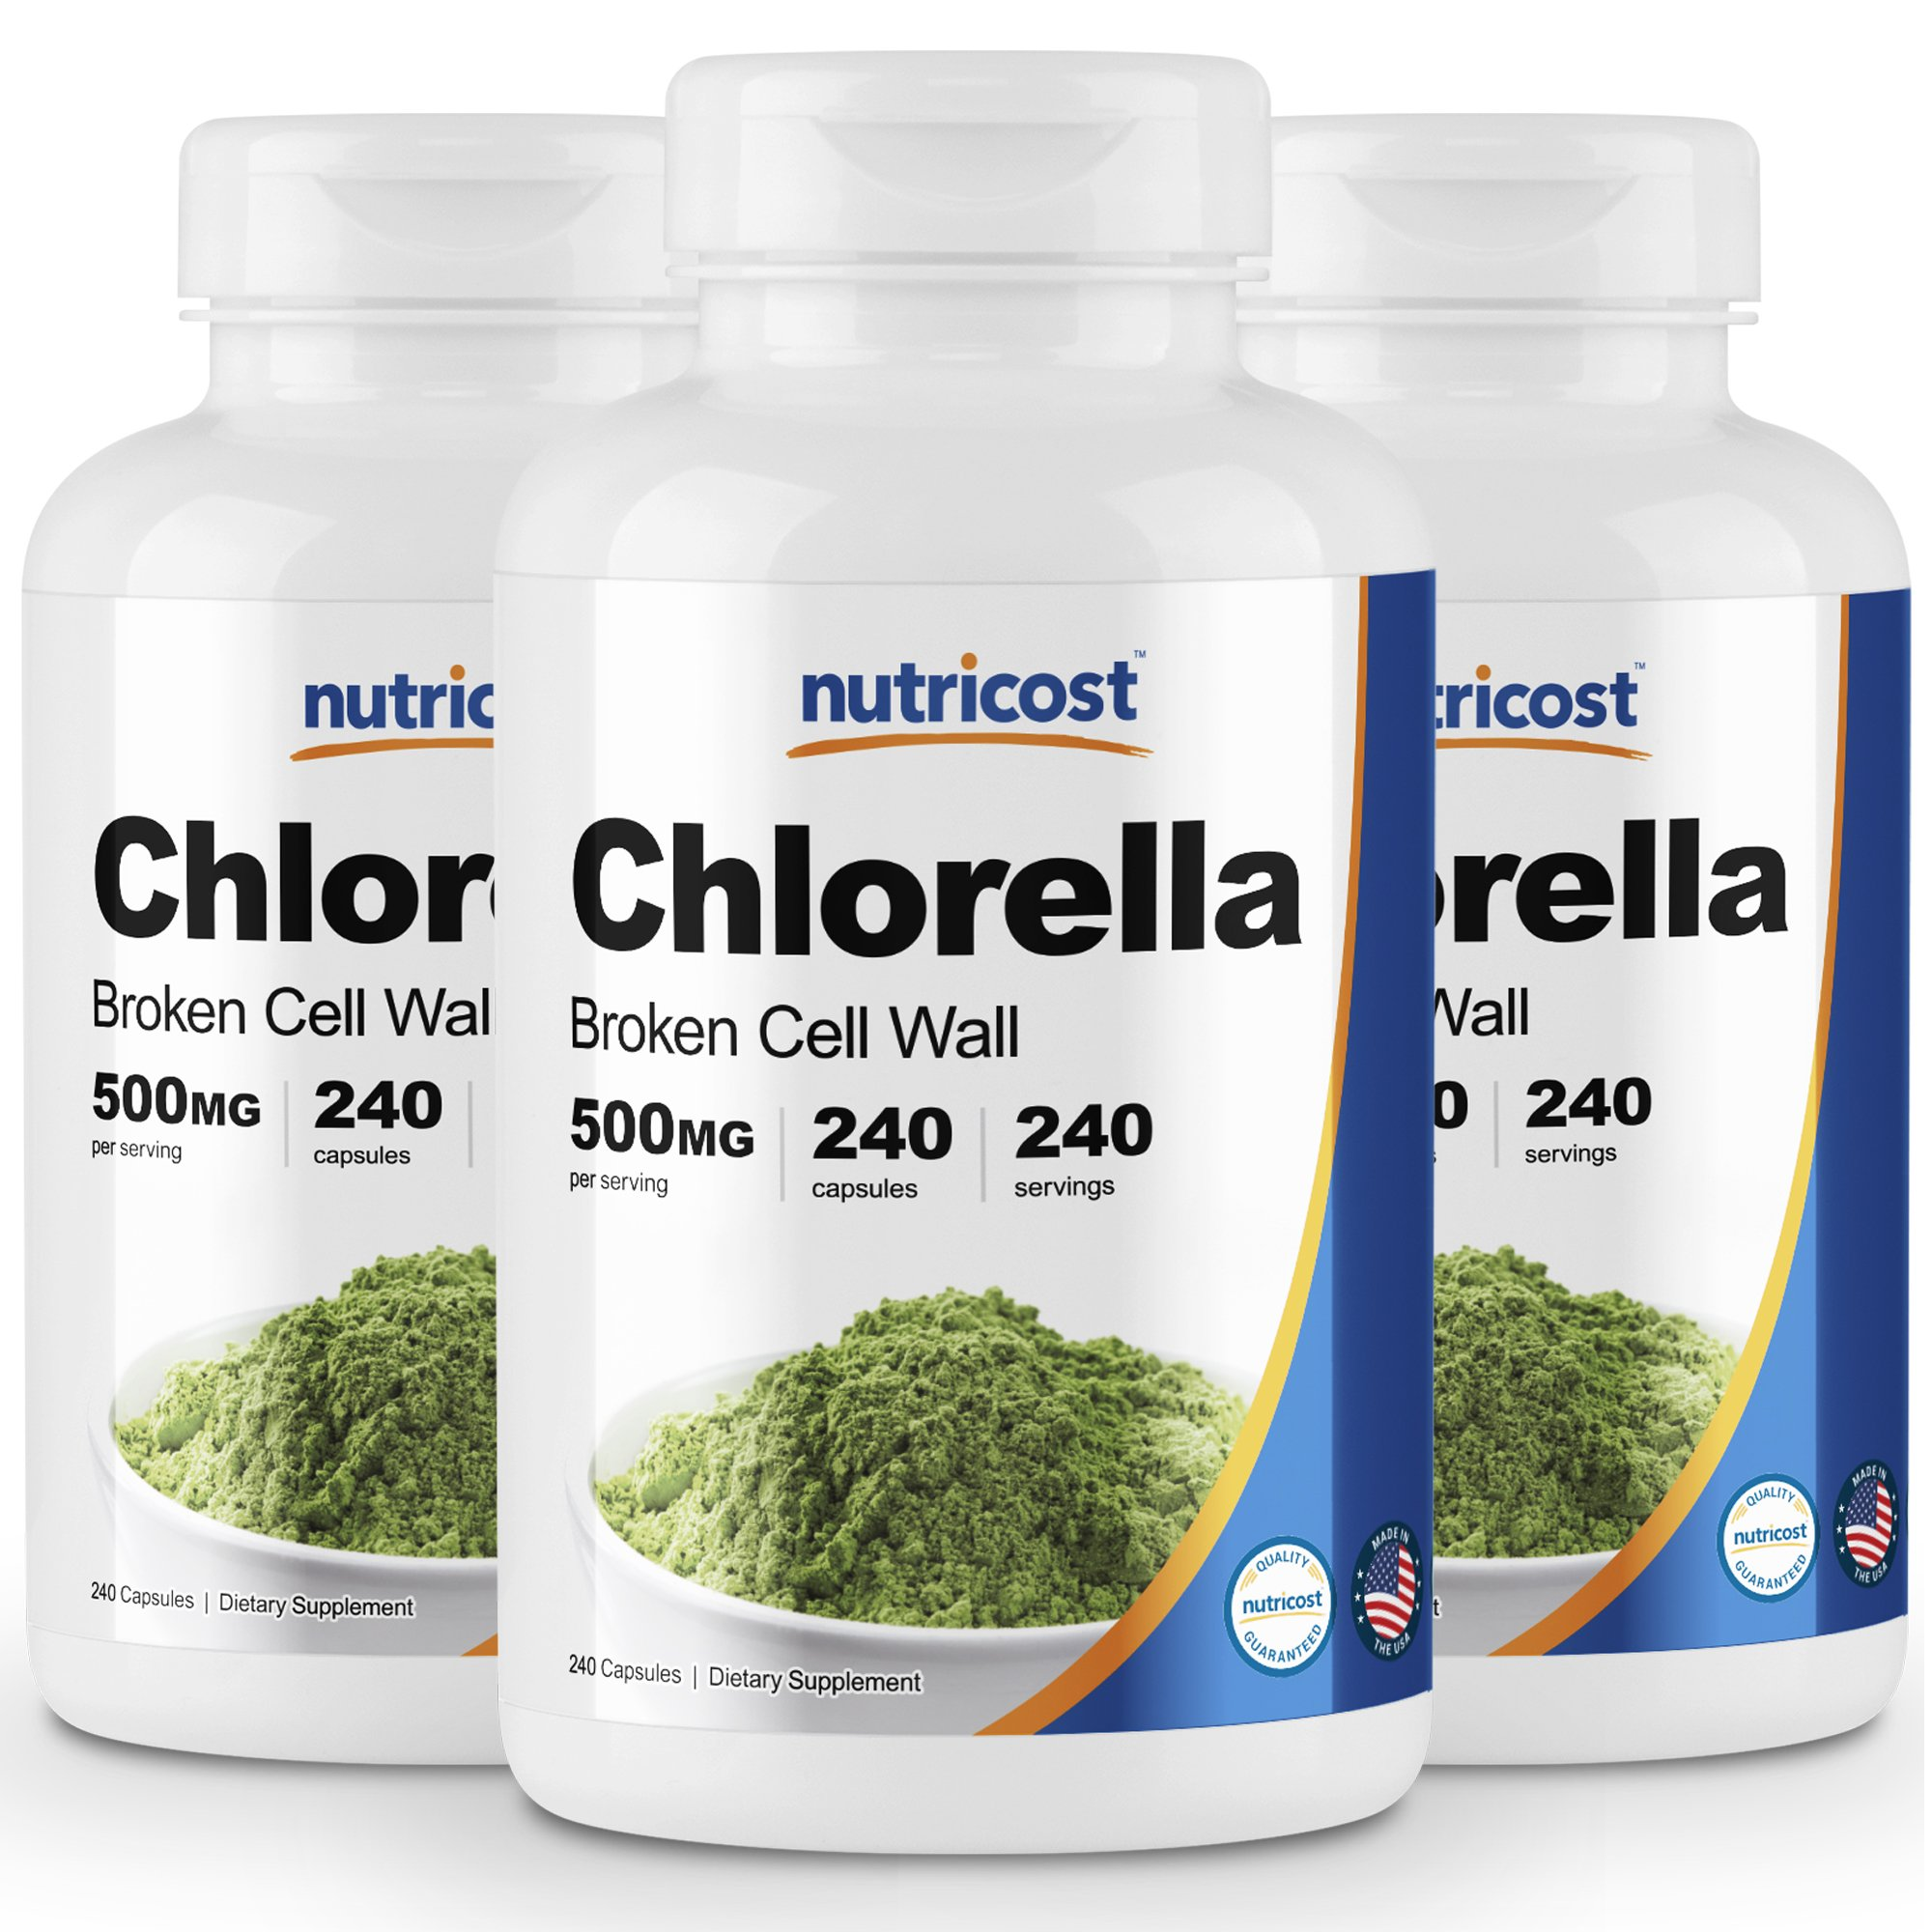 Nutricost Chlorella Capsules (3 Bottles) 500mg, 240 Capsules